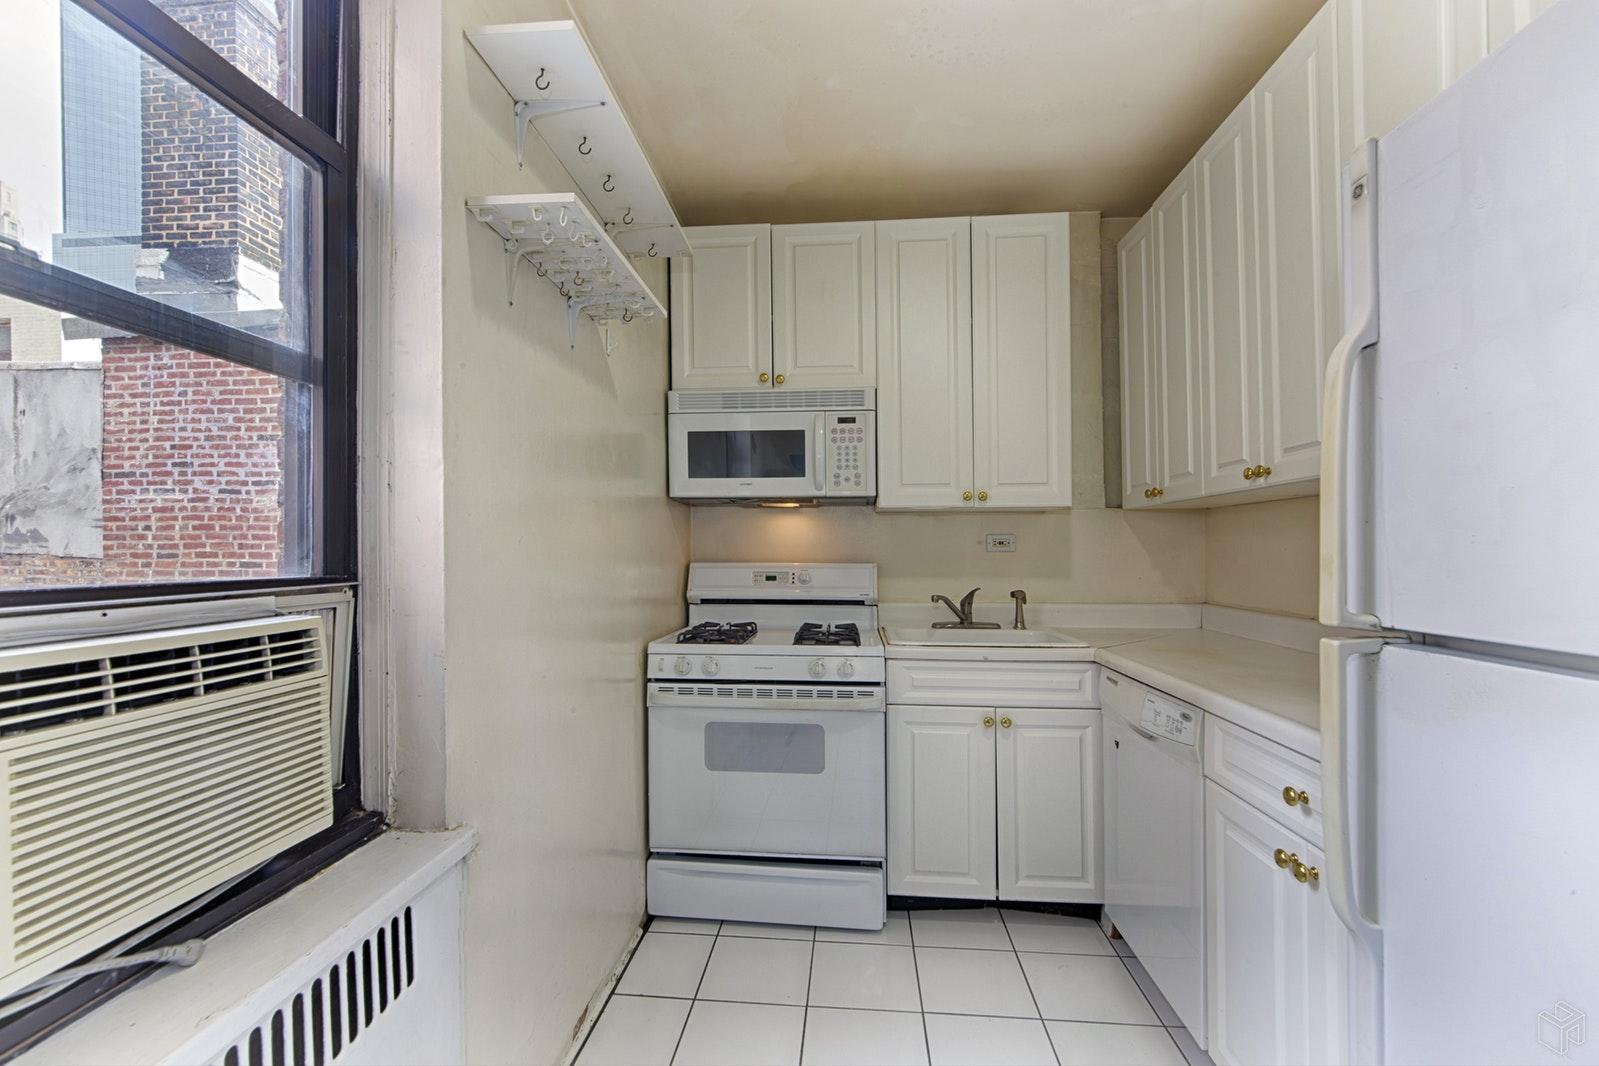 405 WEST 57TH STREET 6F, Midtown West, $699,000, Web #: 19016766